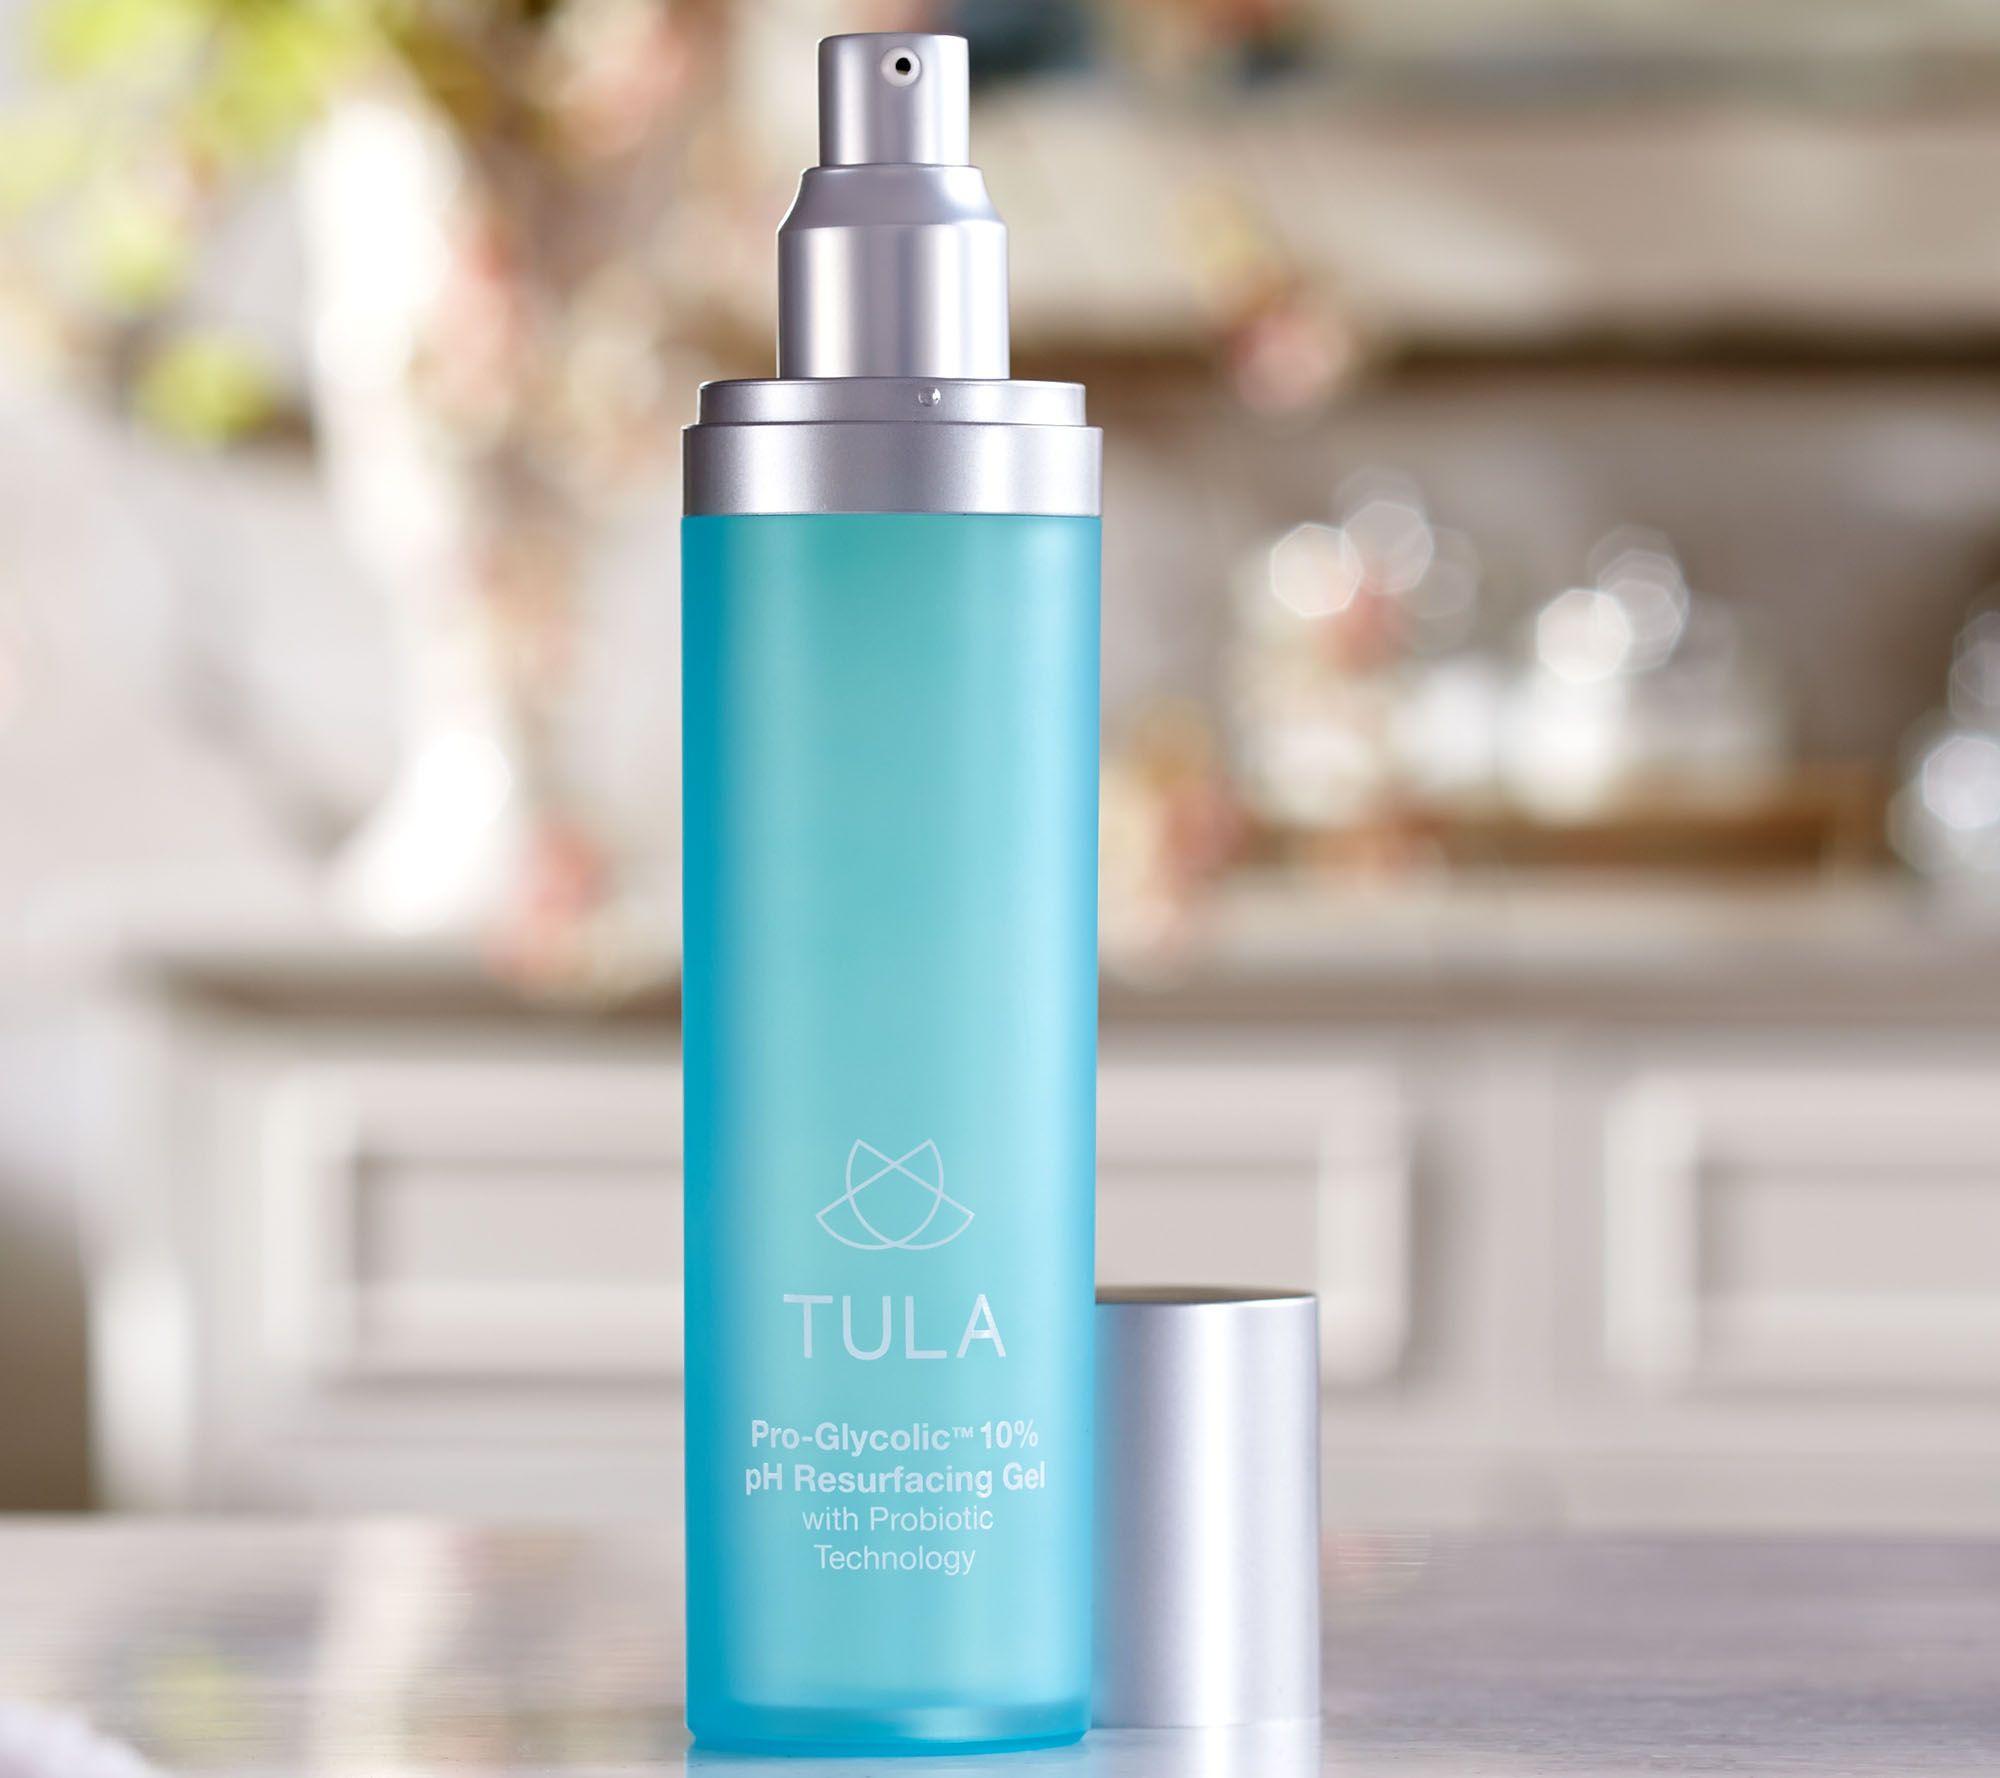 TULA Probiotic Skin Care Pro-Glycolic 10% pH Resurfacing Gel — QVC com